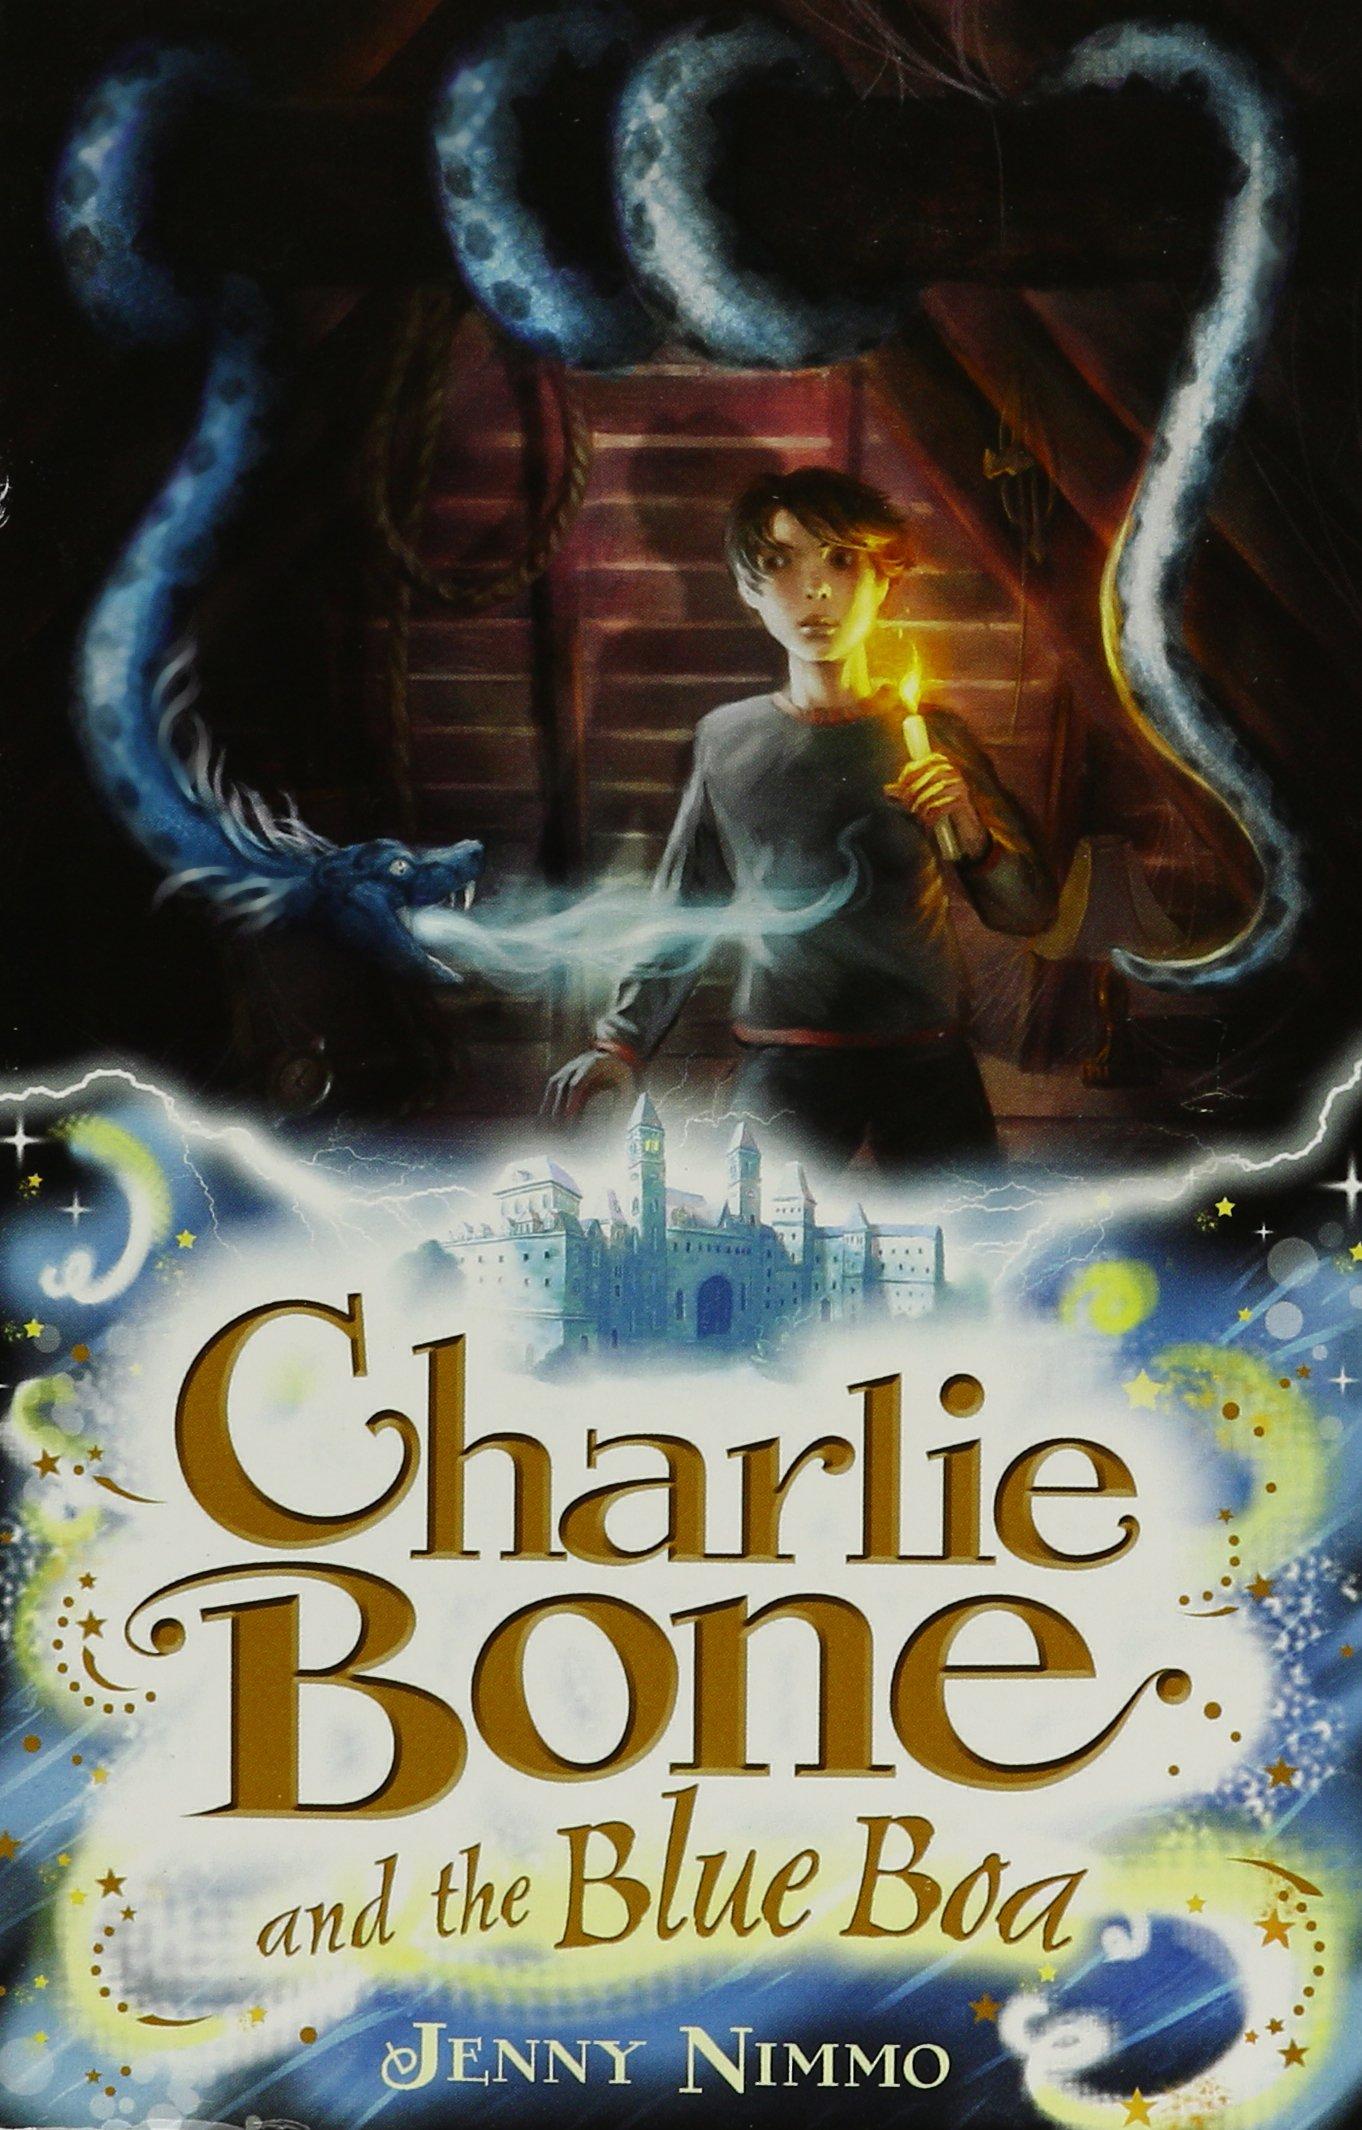 Jenny Nimmo's Charlie Bone 8books Collection: 9783200330634: Amazon:  Books